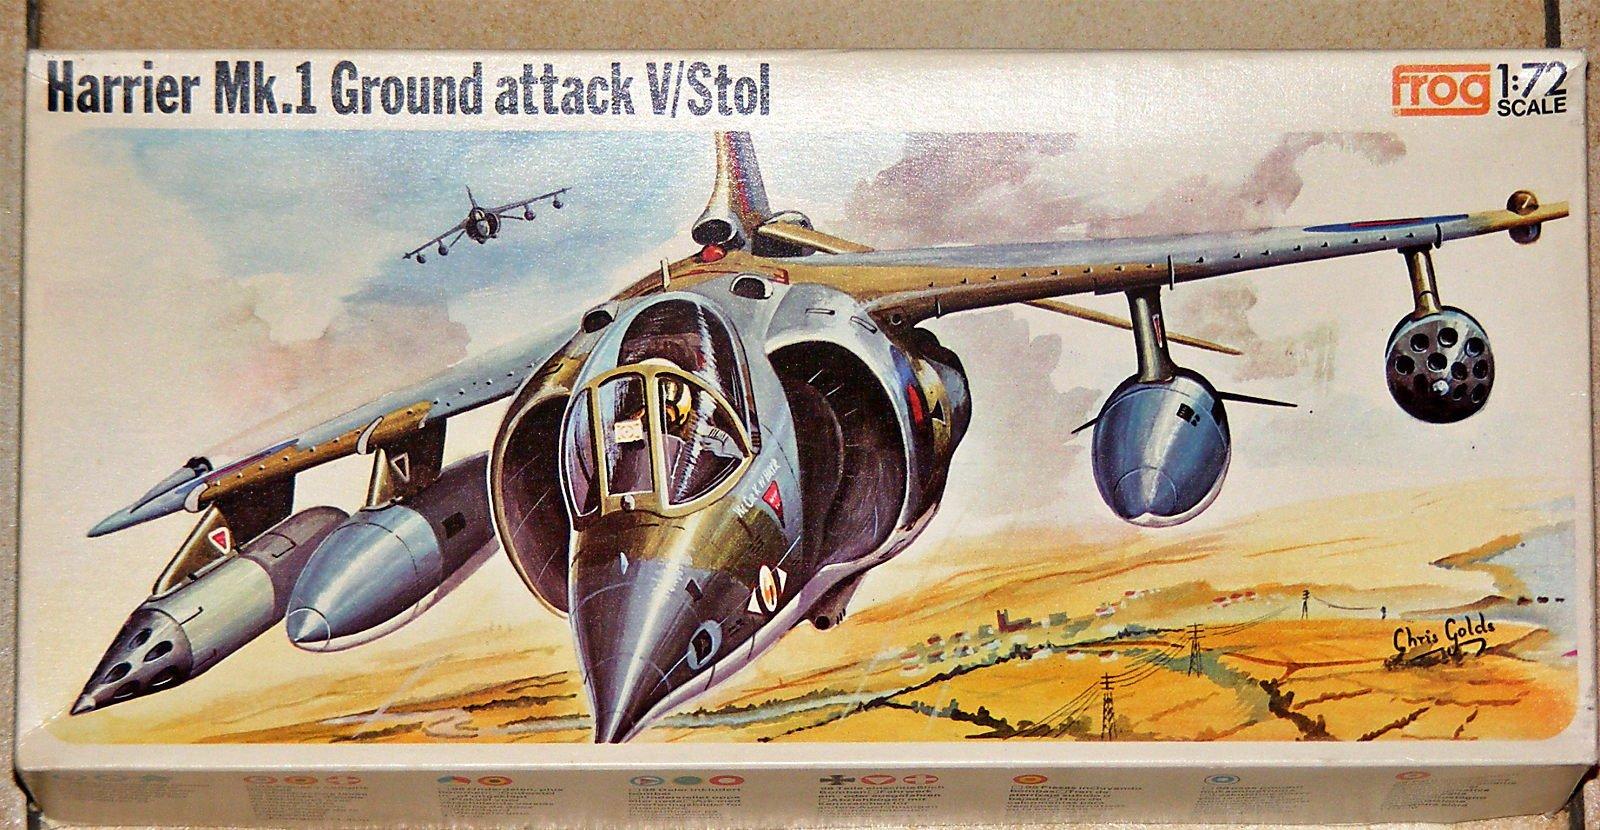 Harrier FROG 1/72